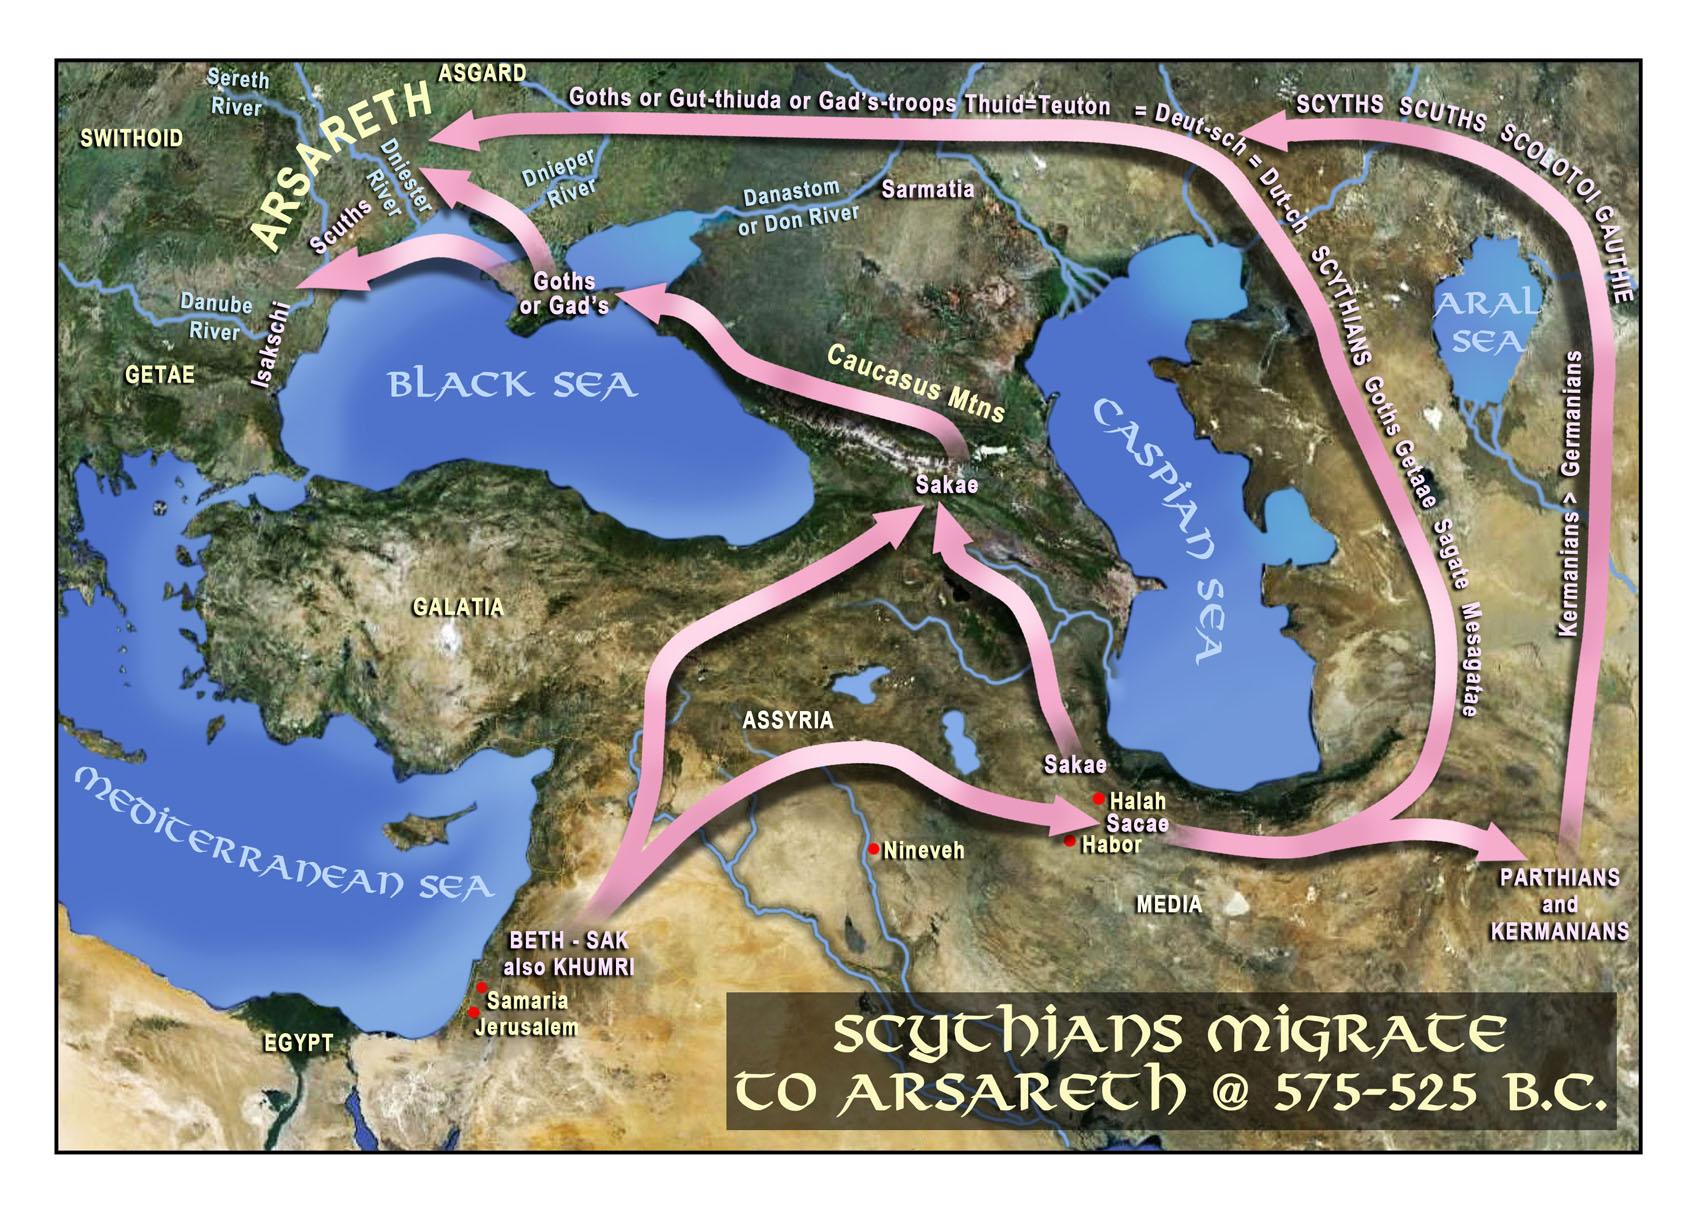 Biblia Mesjańska - Page 7 Scythians-migrate-arsareth